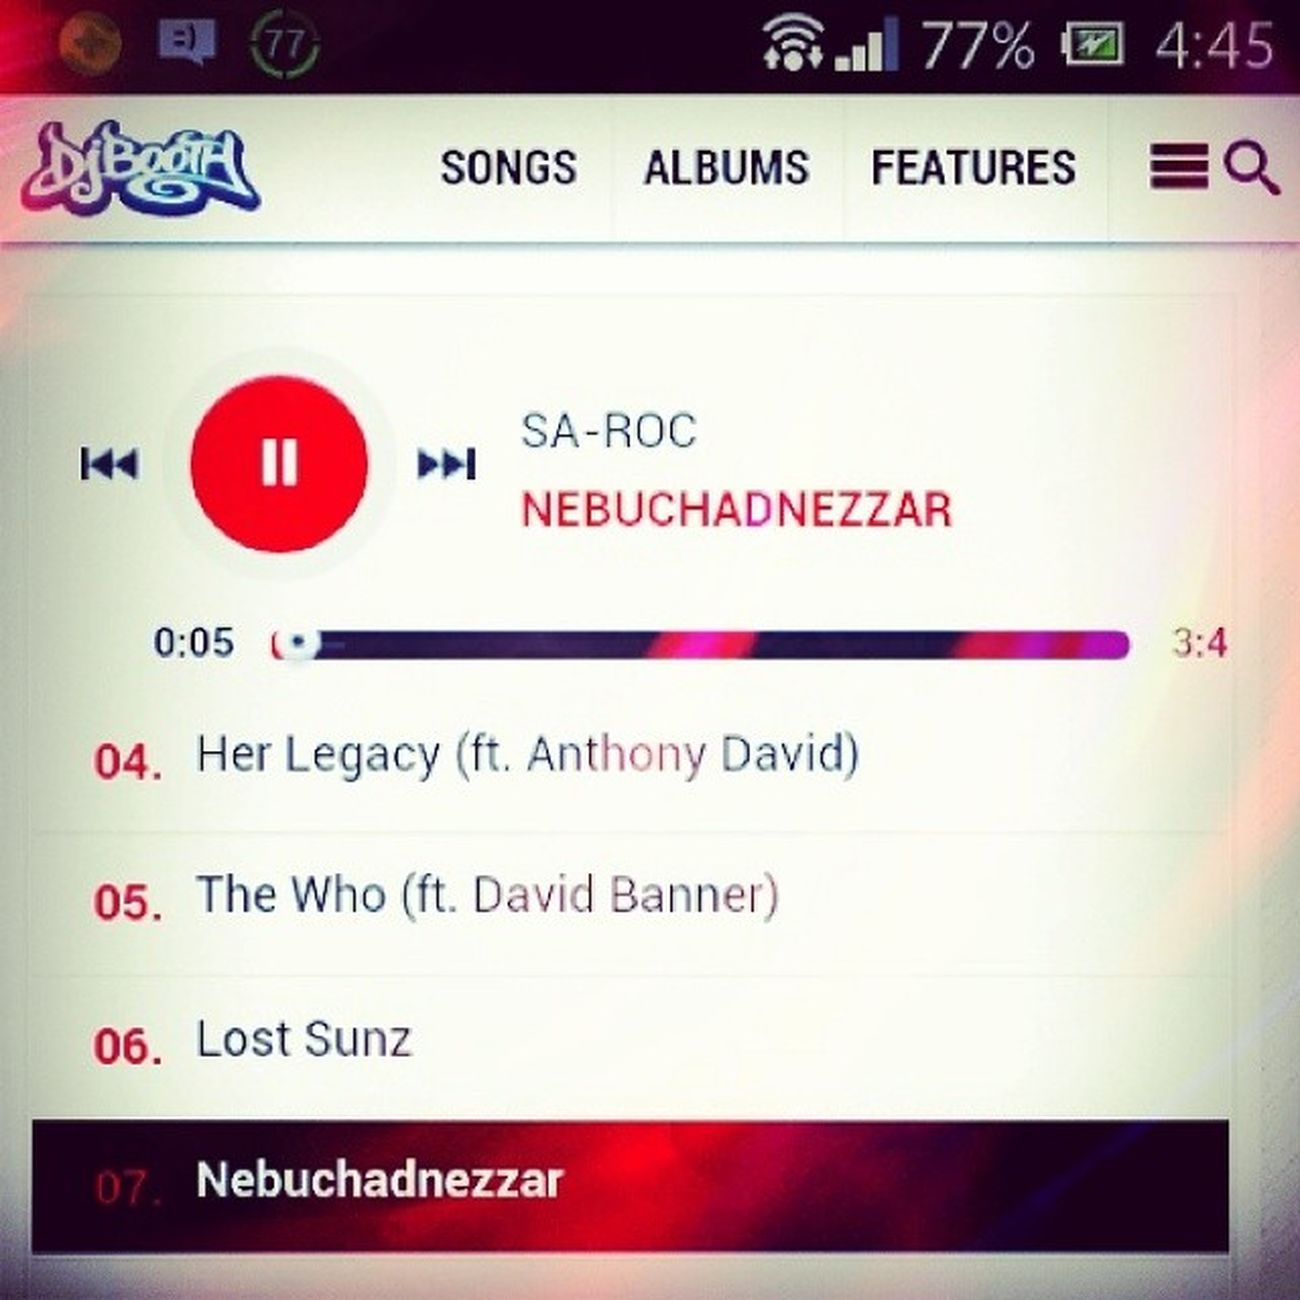 Sa-Roc NEBUCHADNEZZAR album RAAW Salute ?✌?